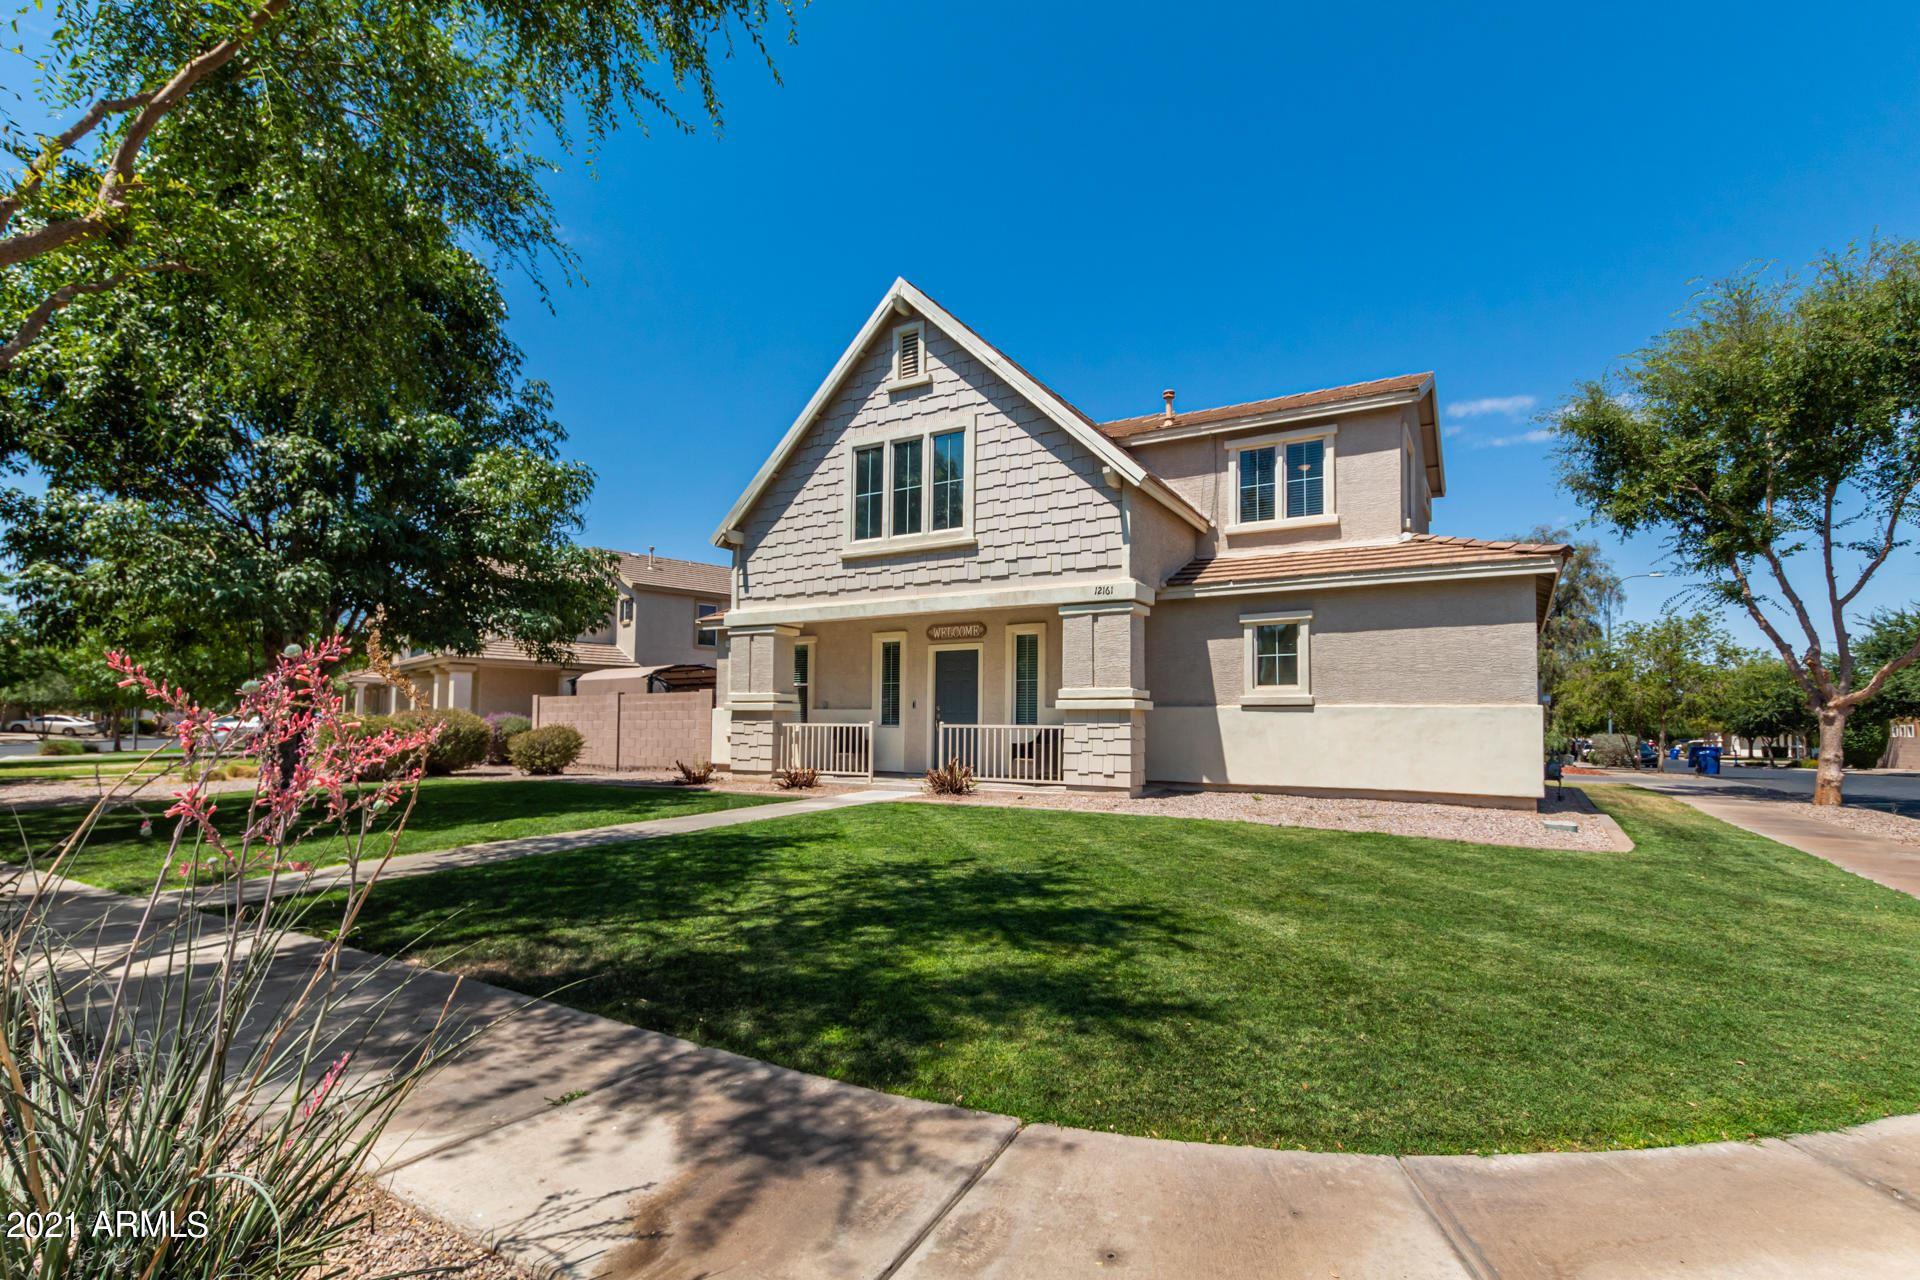 Photo of 12161 W FLANAGAN Street, Avondale, AZ 85323 (MLS # 6245267)